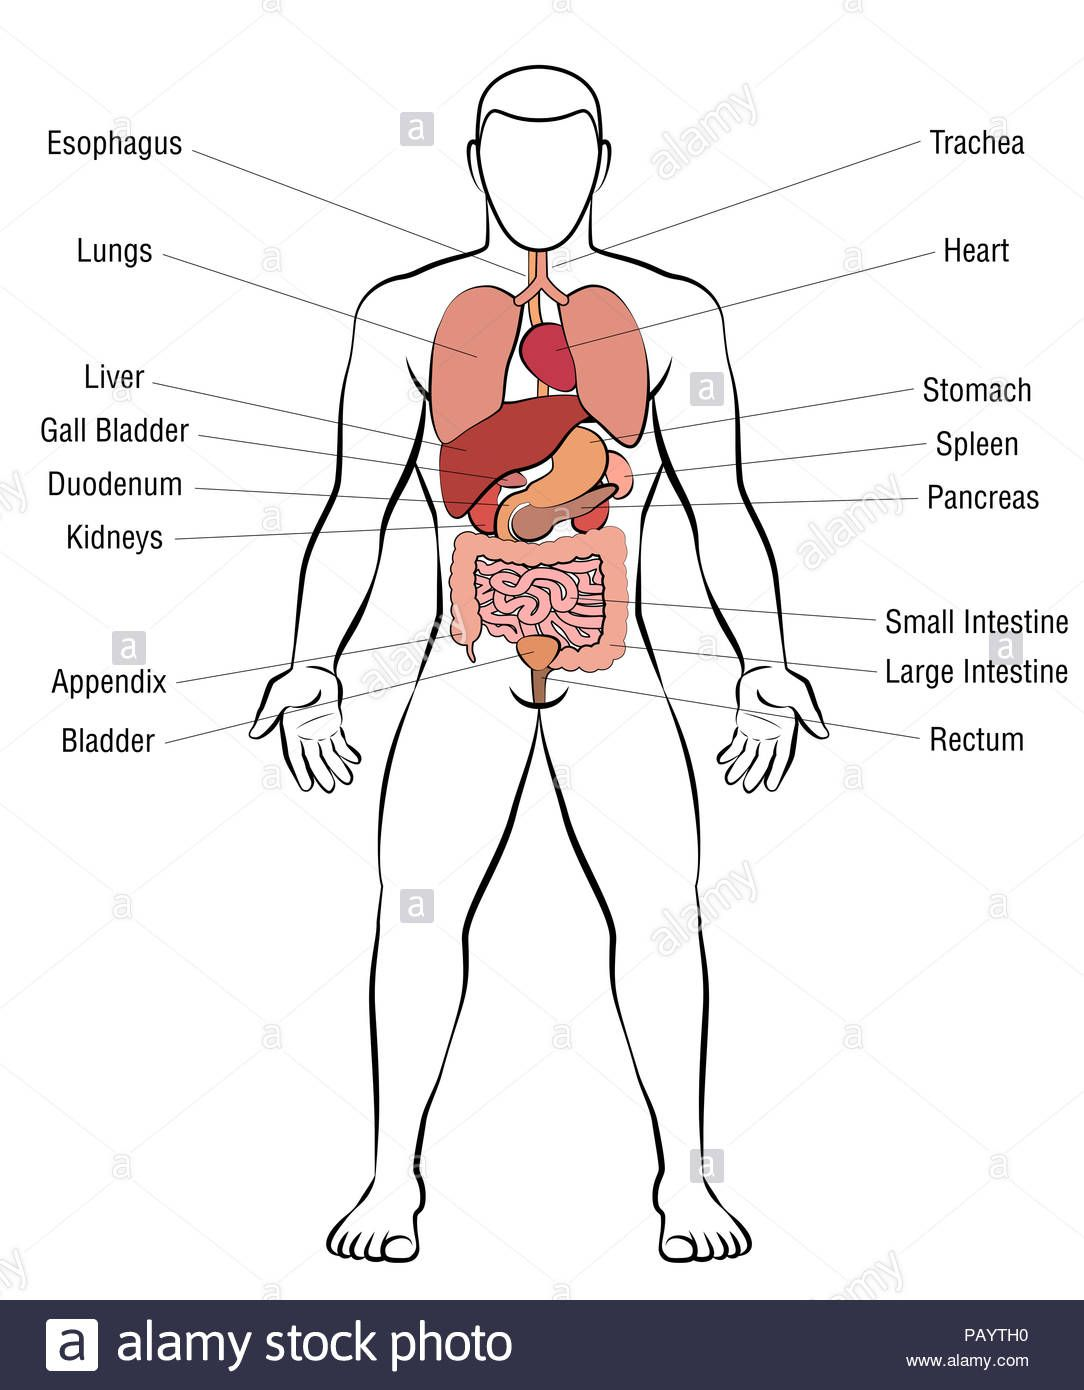 picture internal organs internal organs male body schematic human anatomy illustration [ 1084 x 1390 Pixel ]